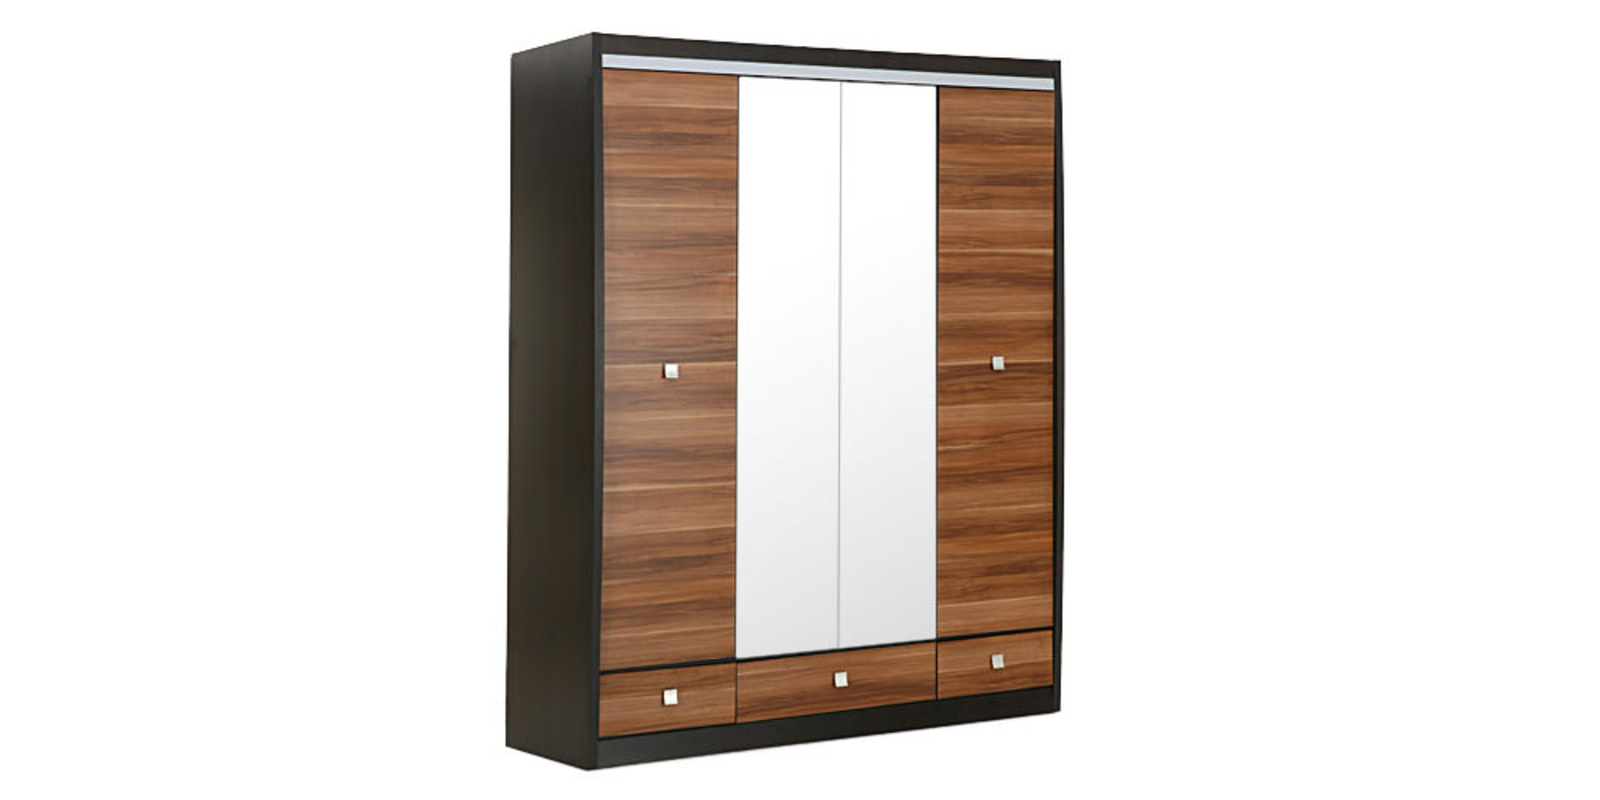 Шкаф распашной четырехдверный Корсика (слива валлис+зеркало/дуб феррара)